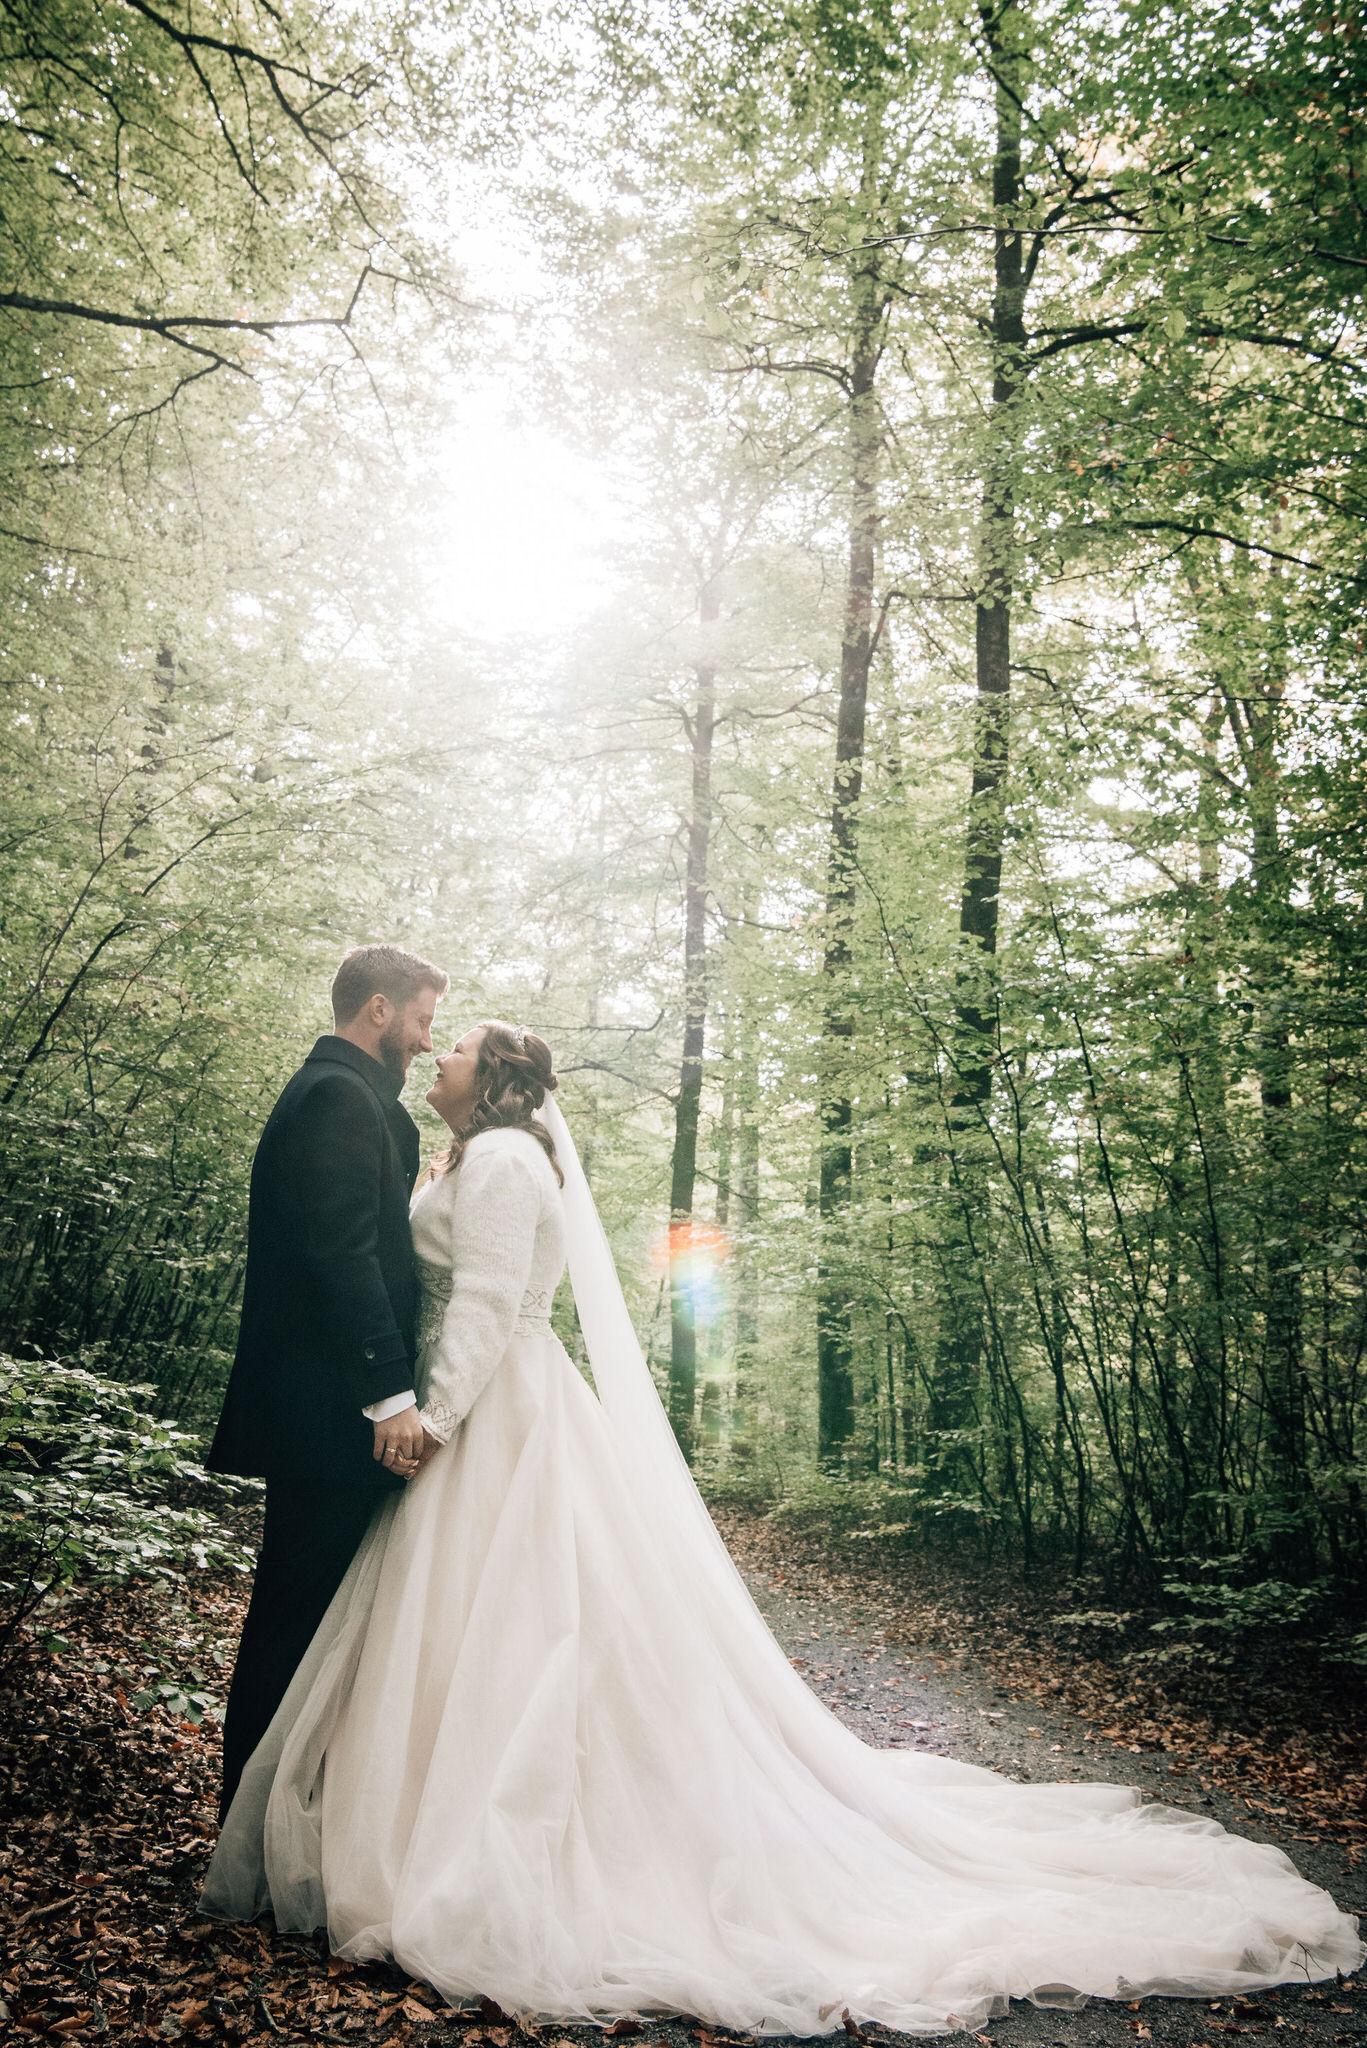 750_0030_fotografering_larvik_bryllup_aspargesgarden_.jpg